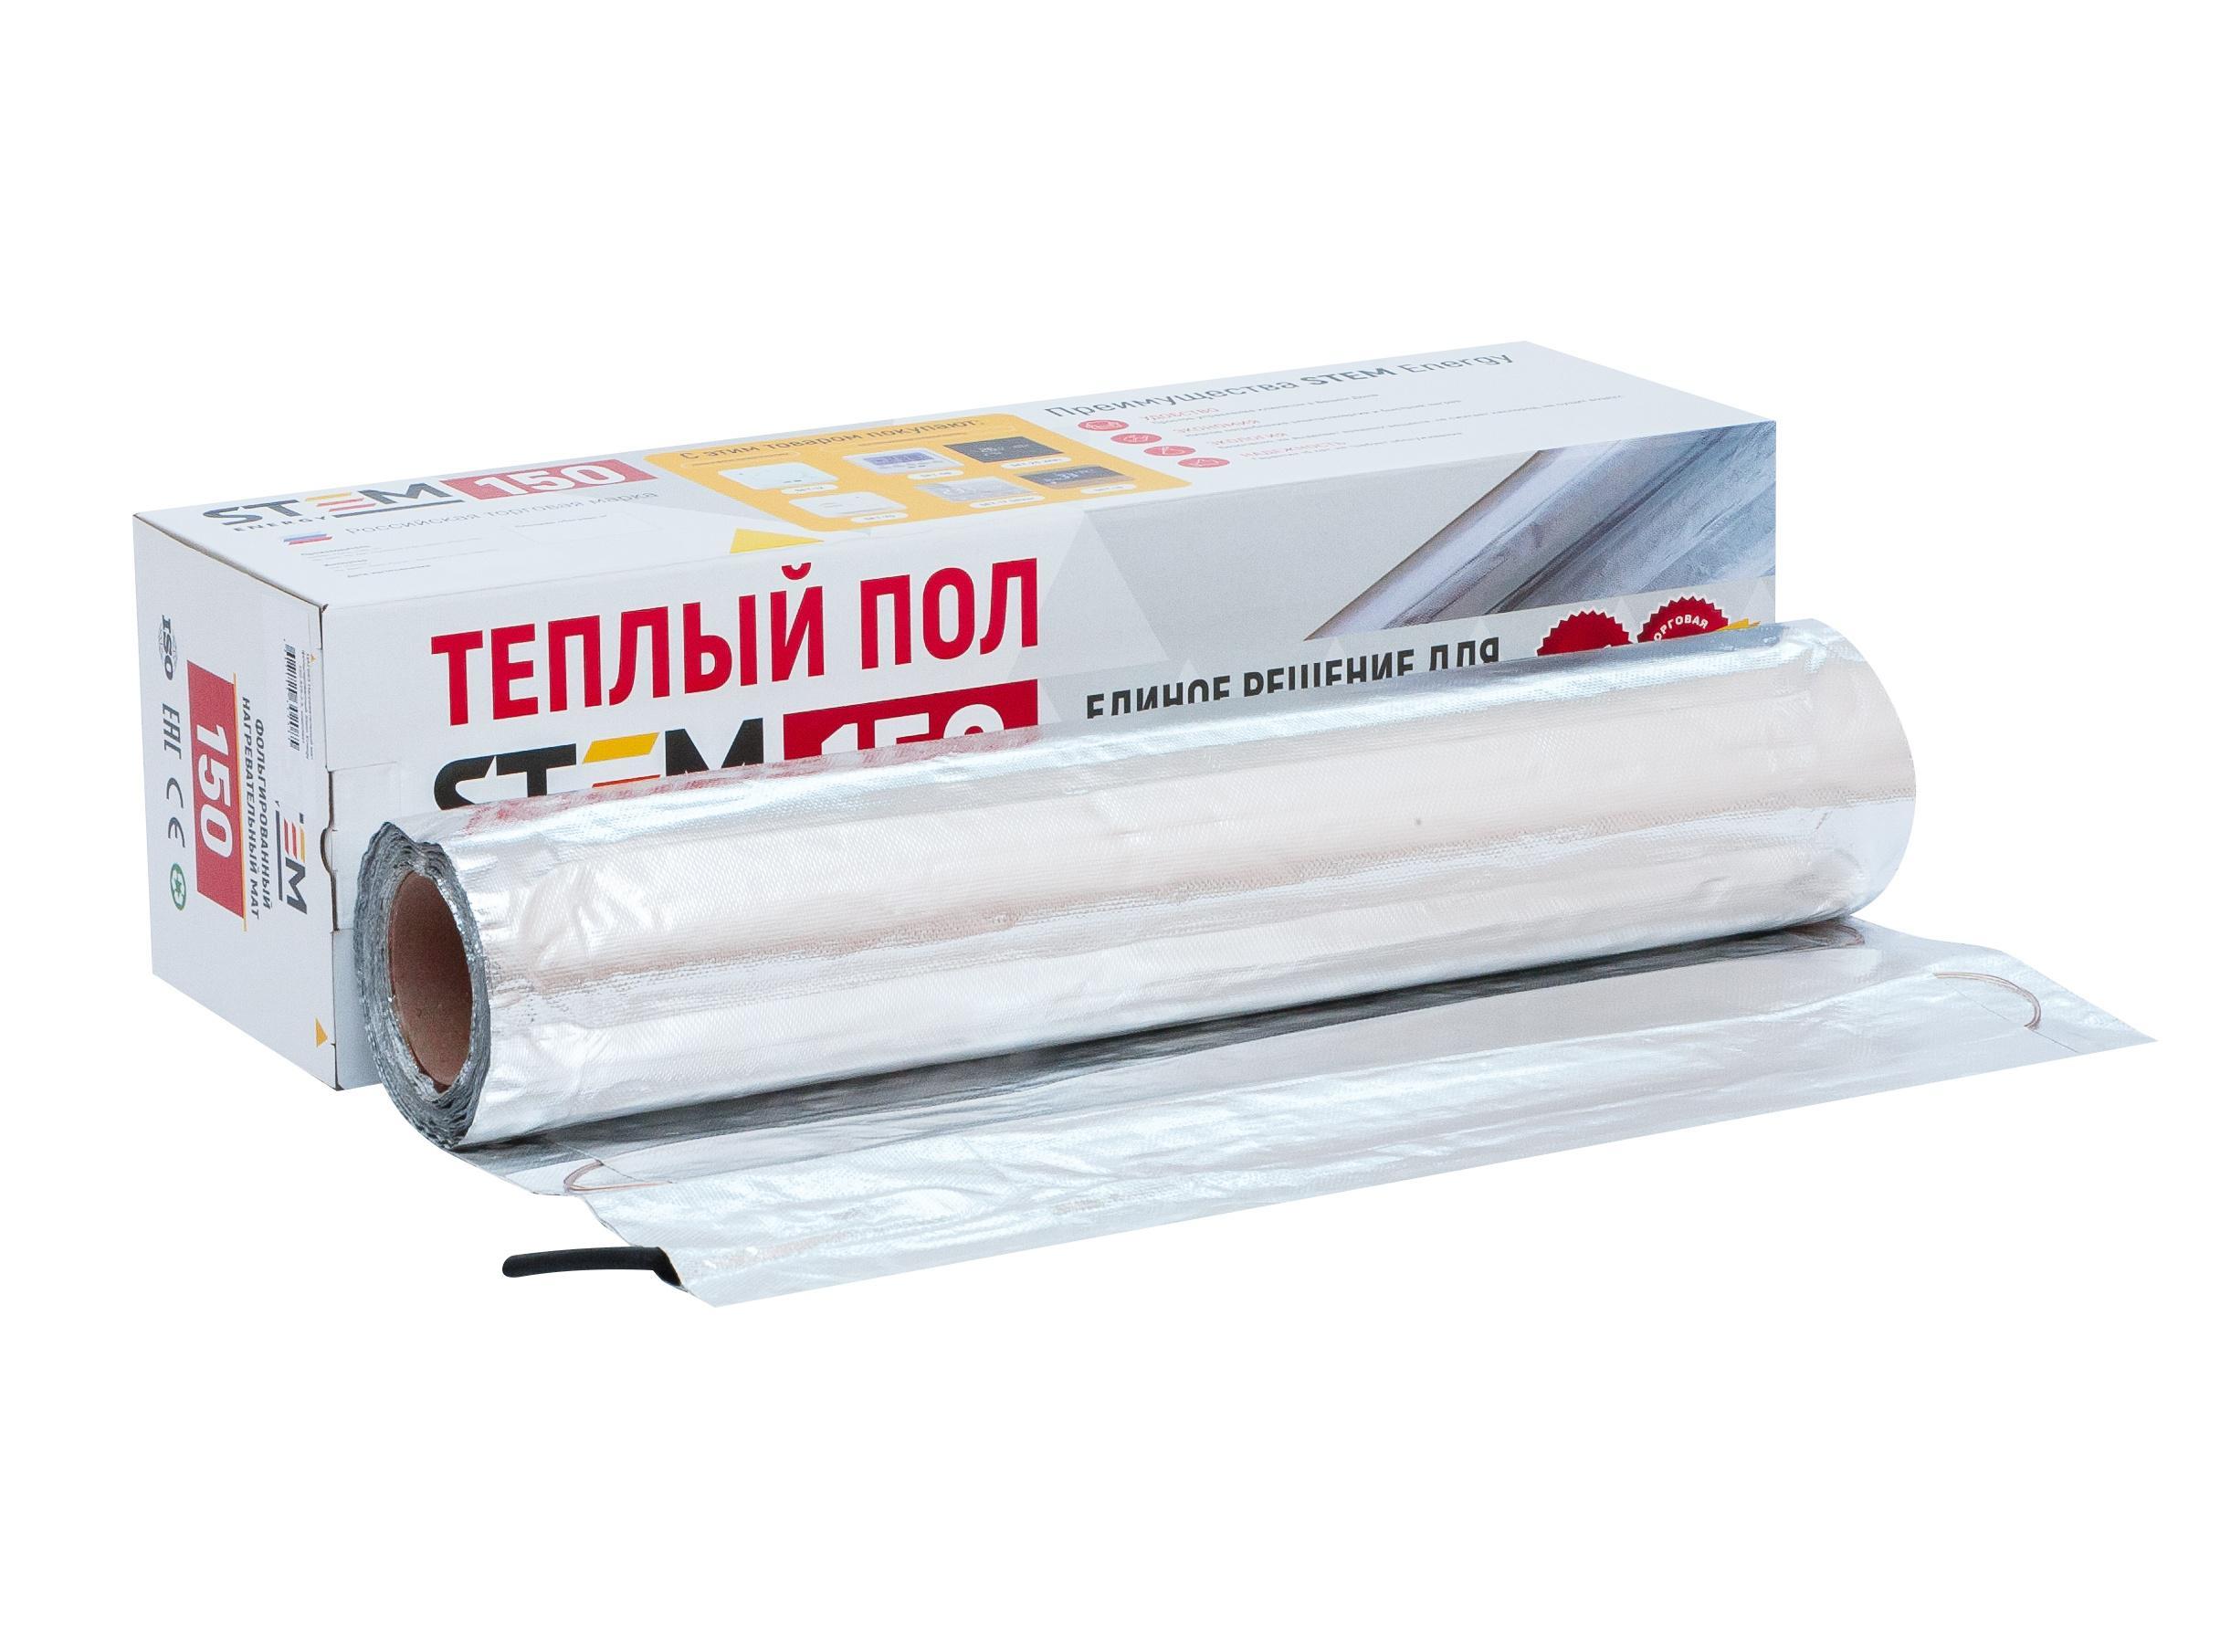 Теплый пол Stem energy 150-375-2.5